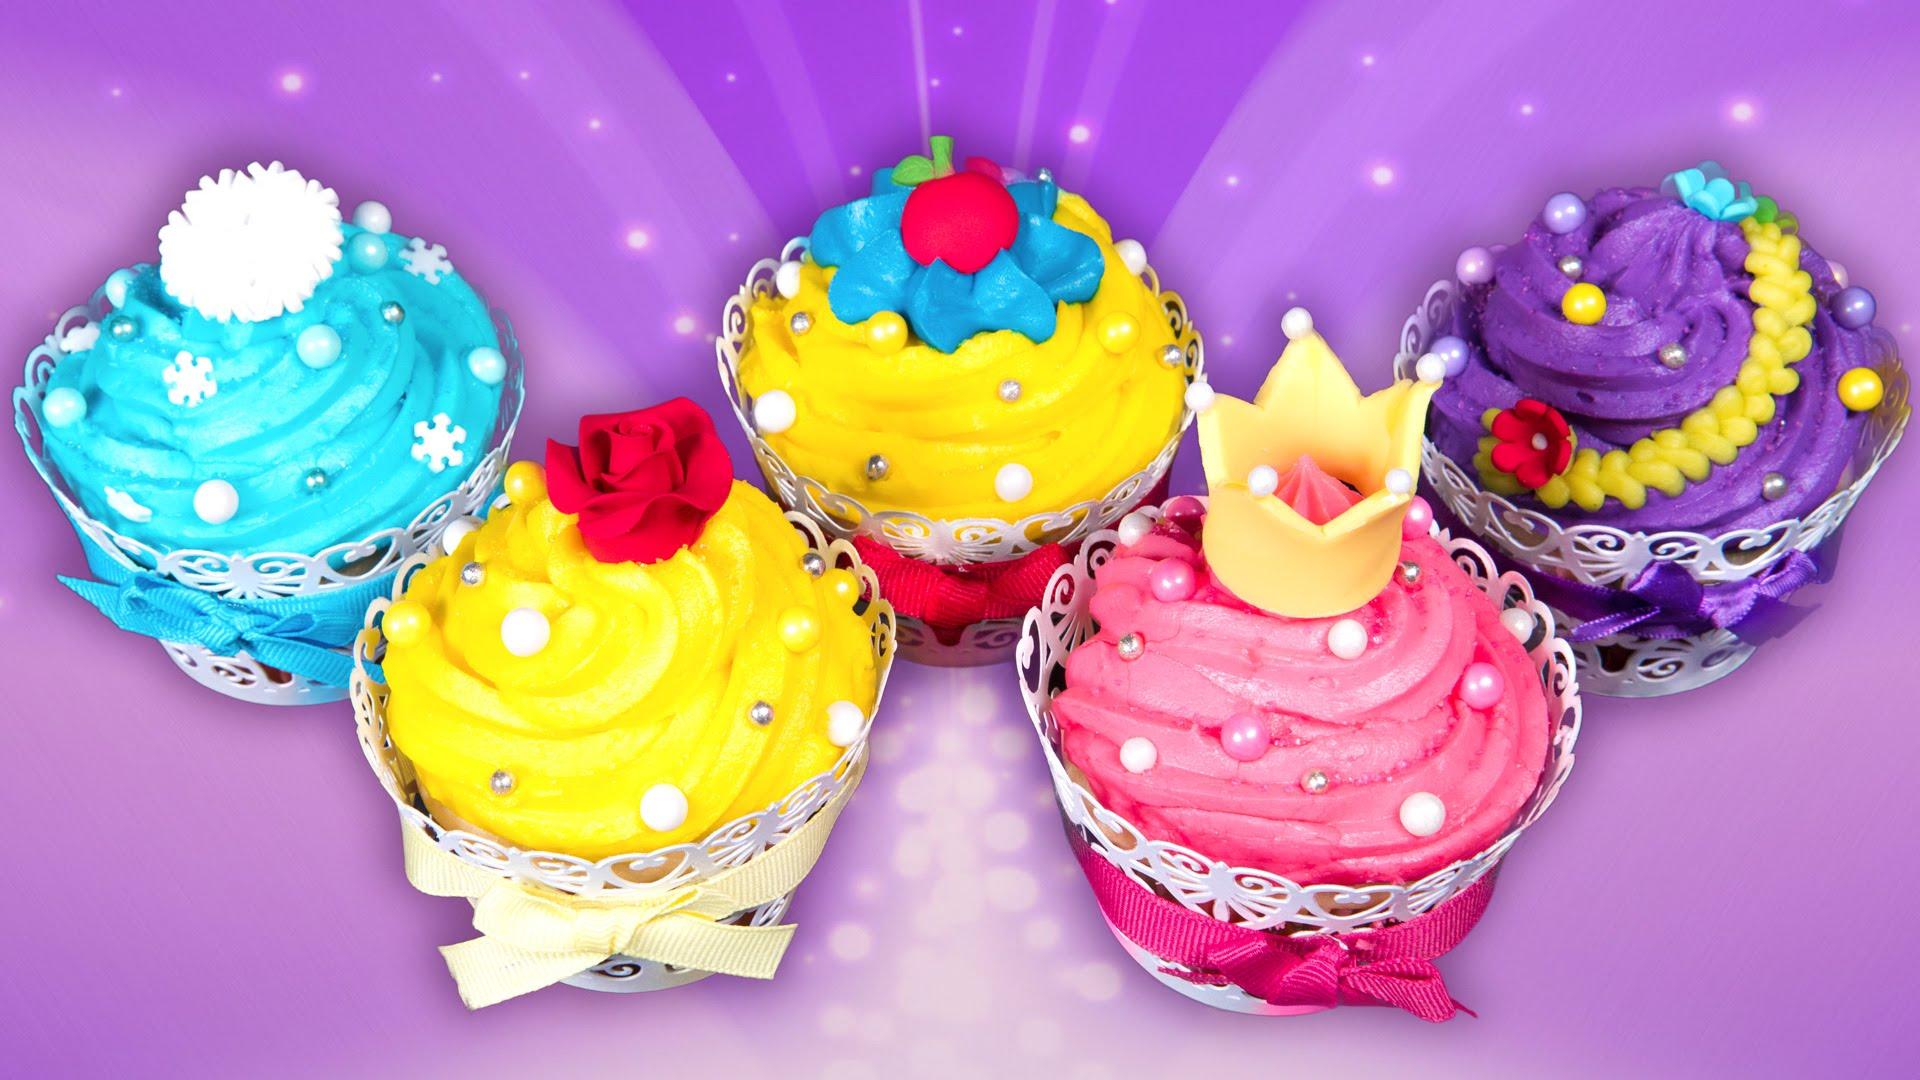 Princess Cupcakes Like No Other